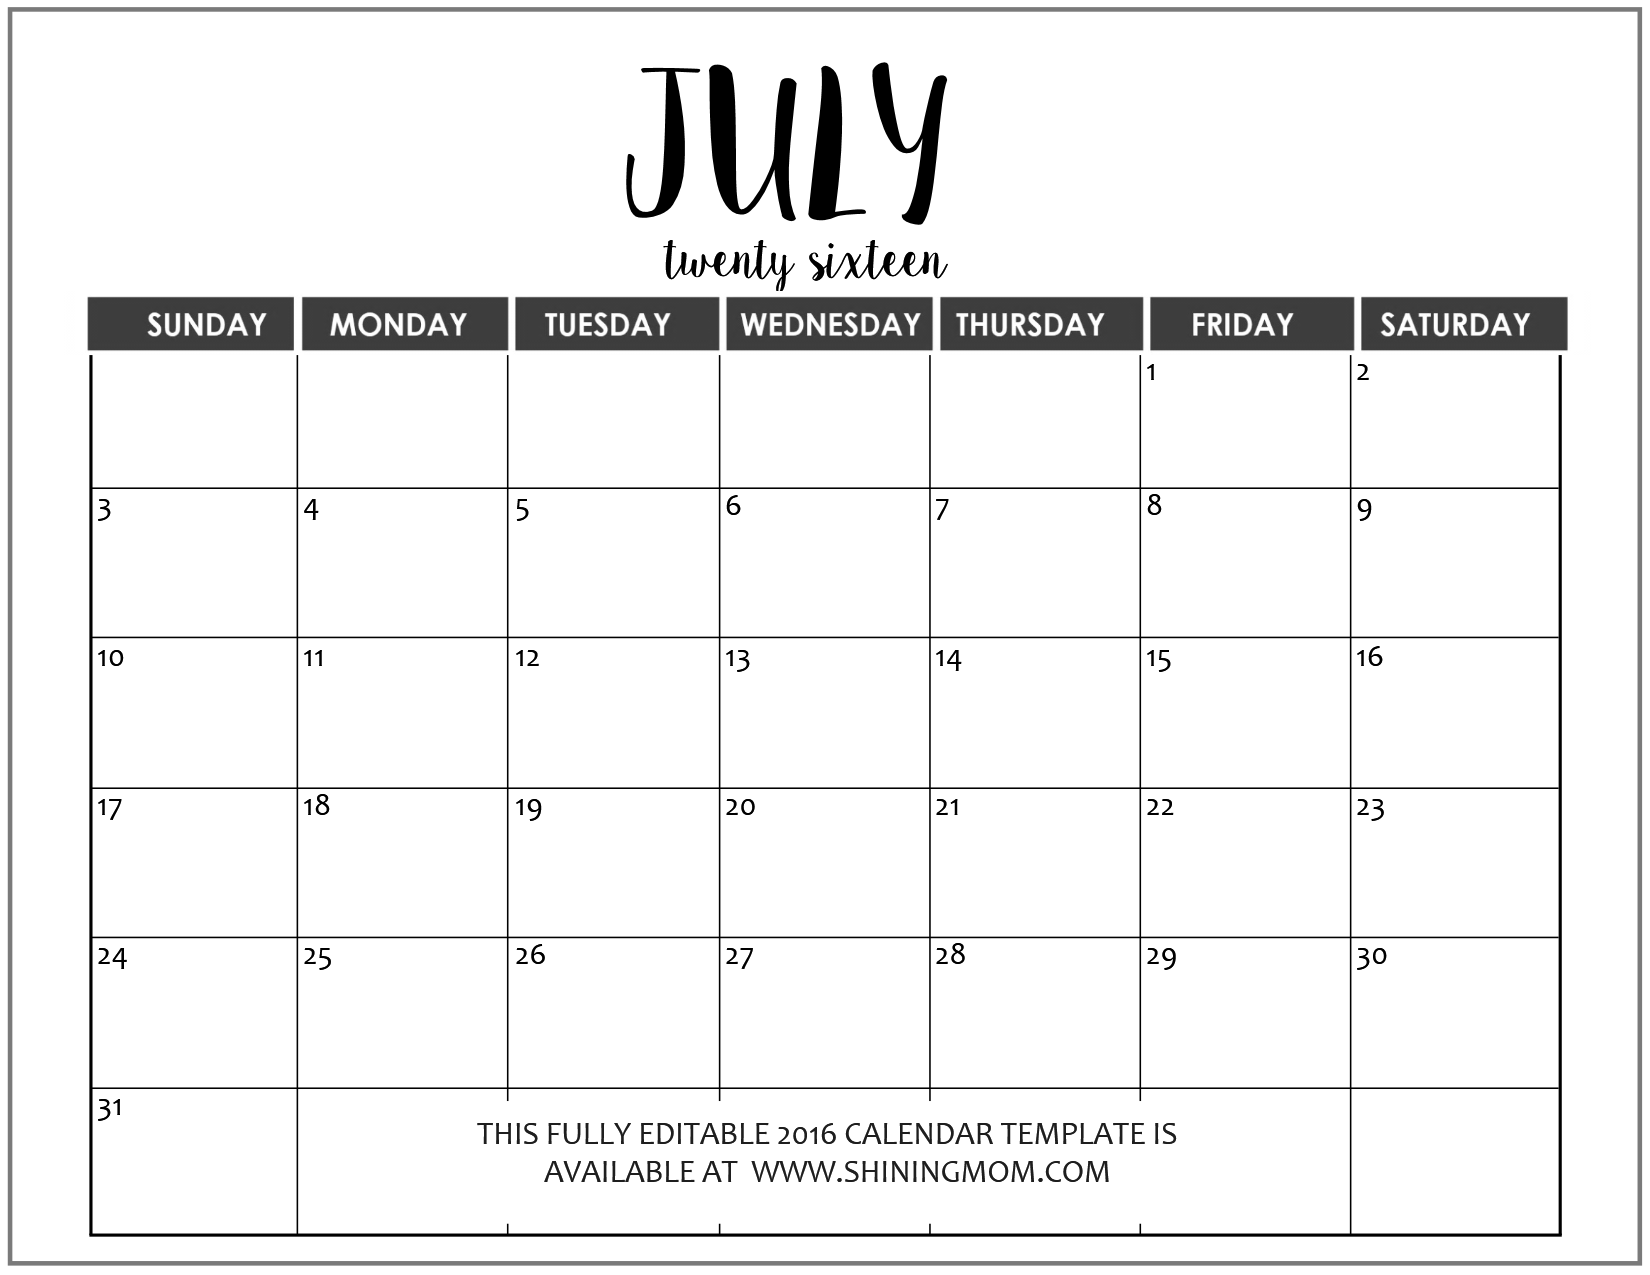 July 2016 calendar clipart free download July 2016 calendar planner free download